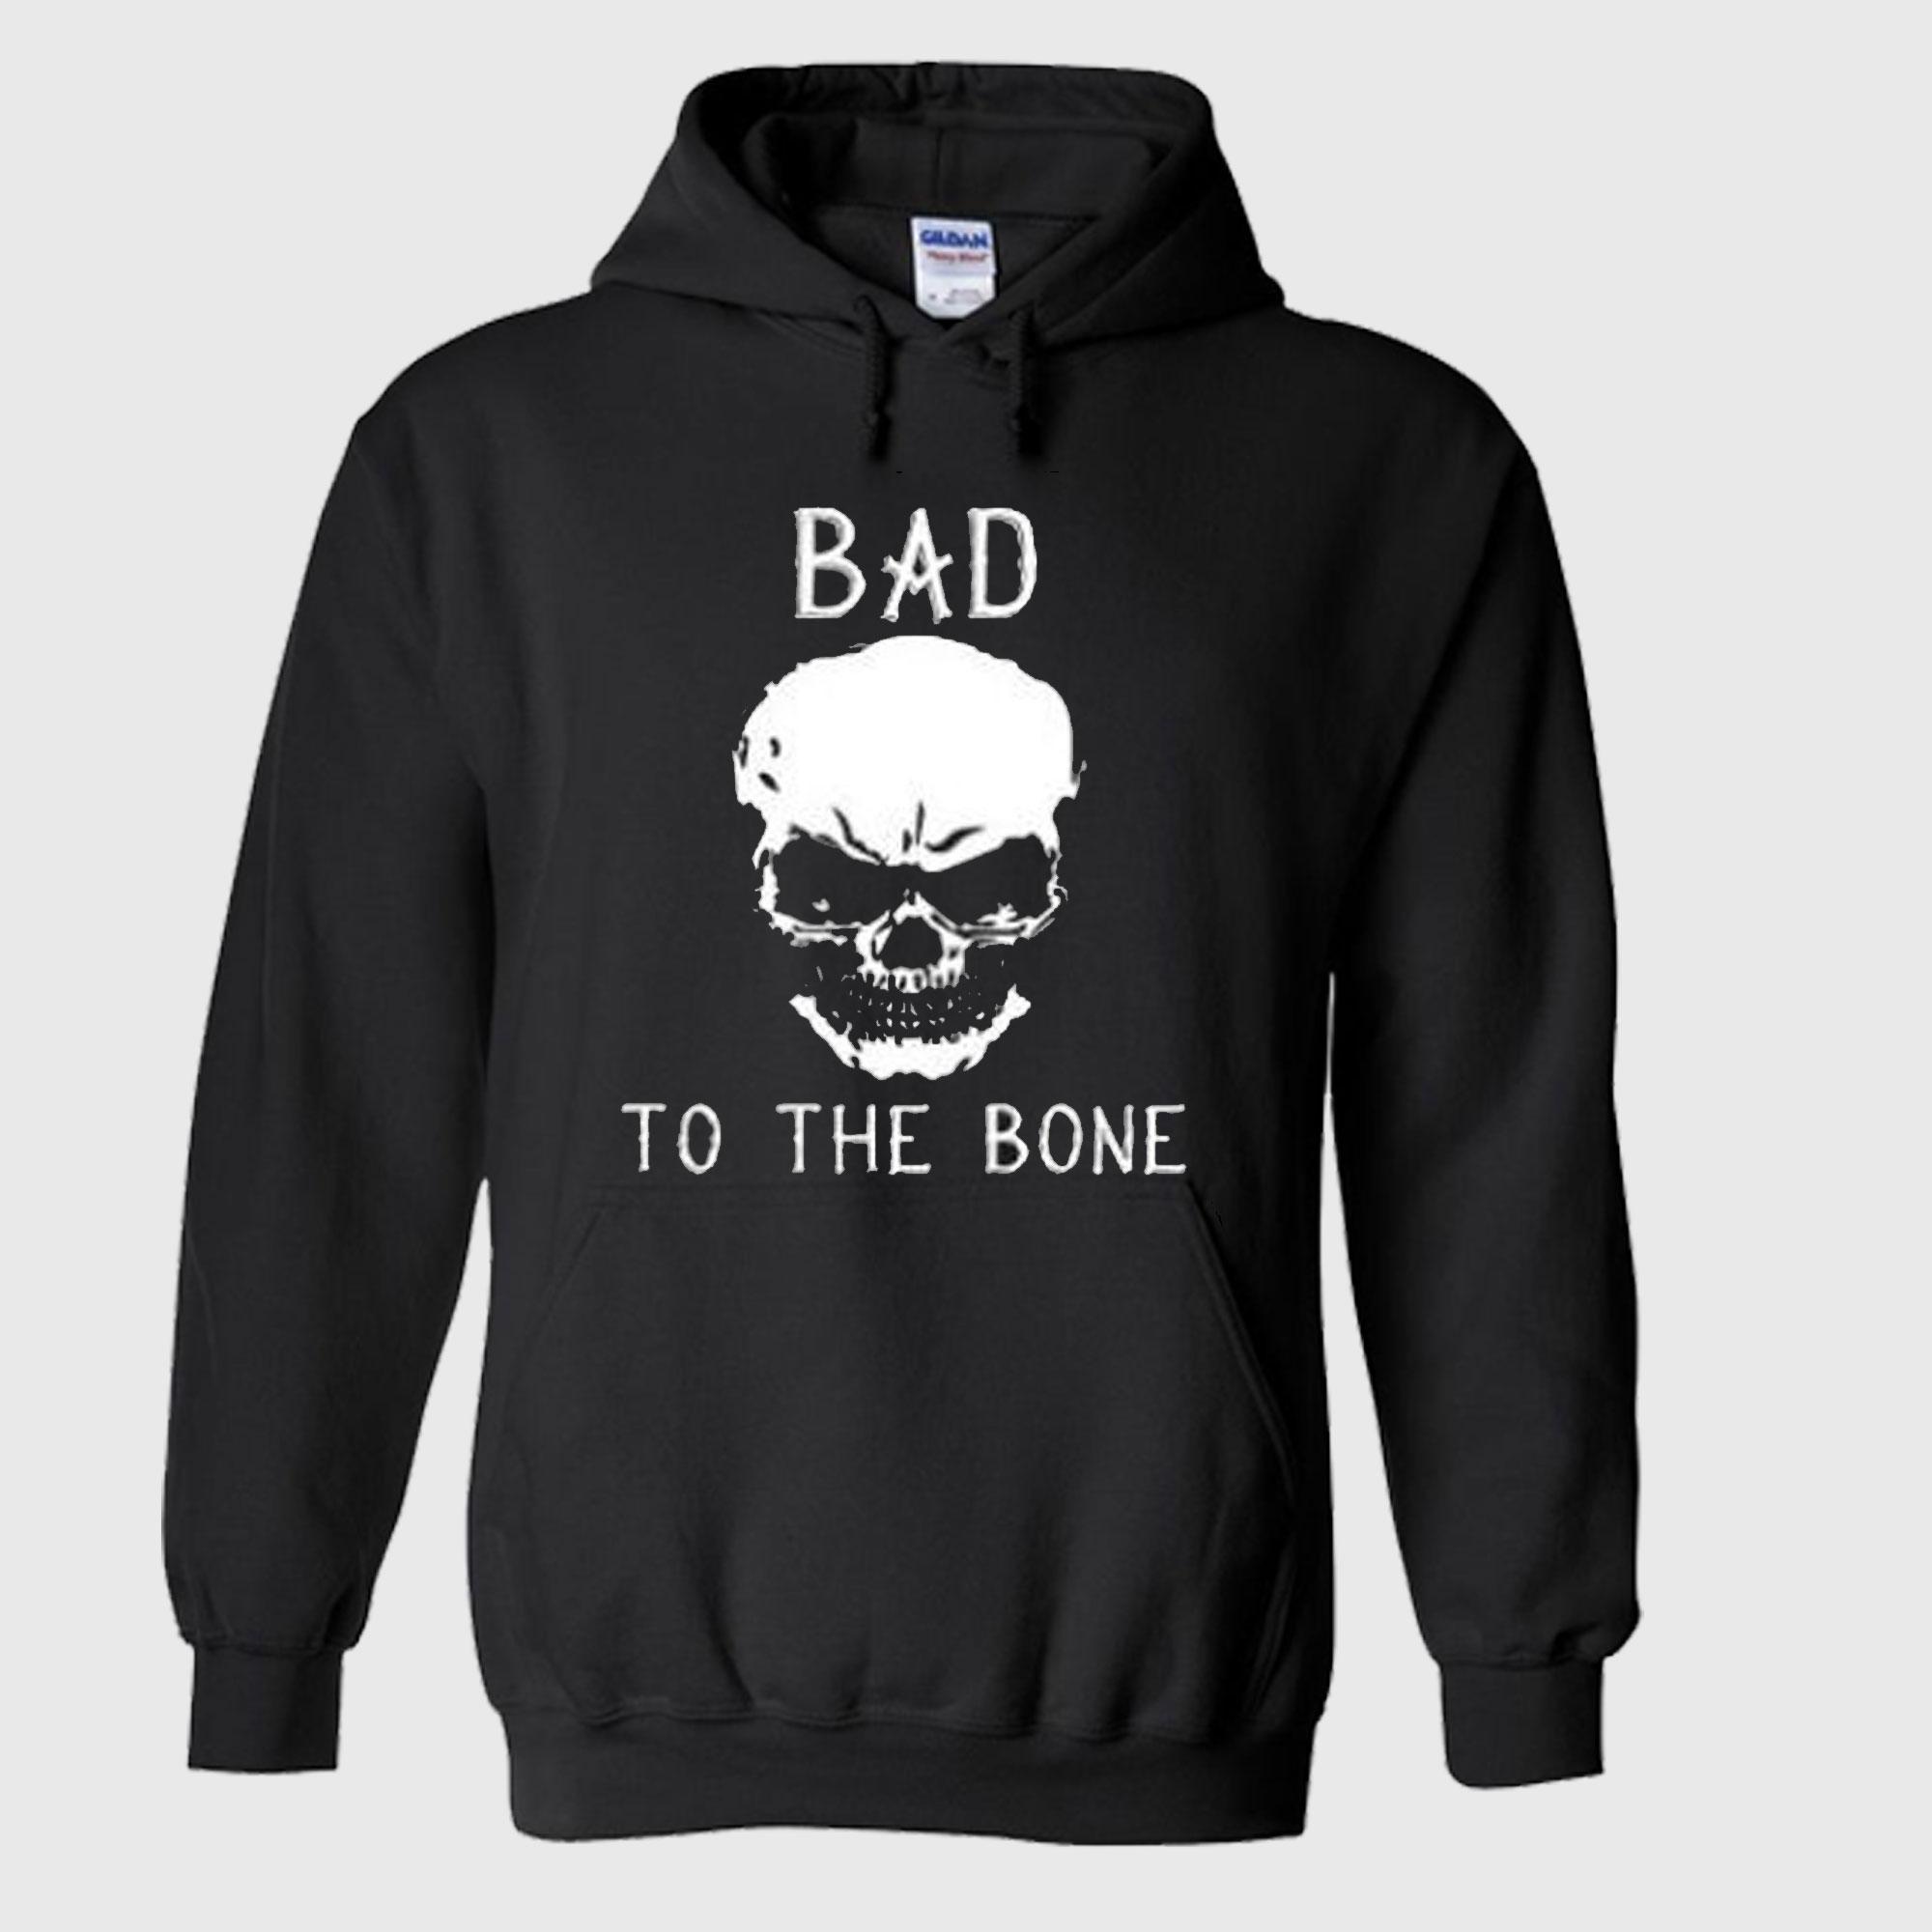 Bad to the bone Skull Hoodie